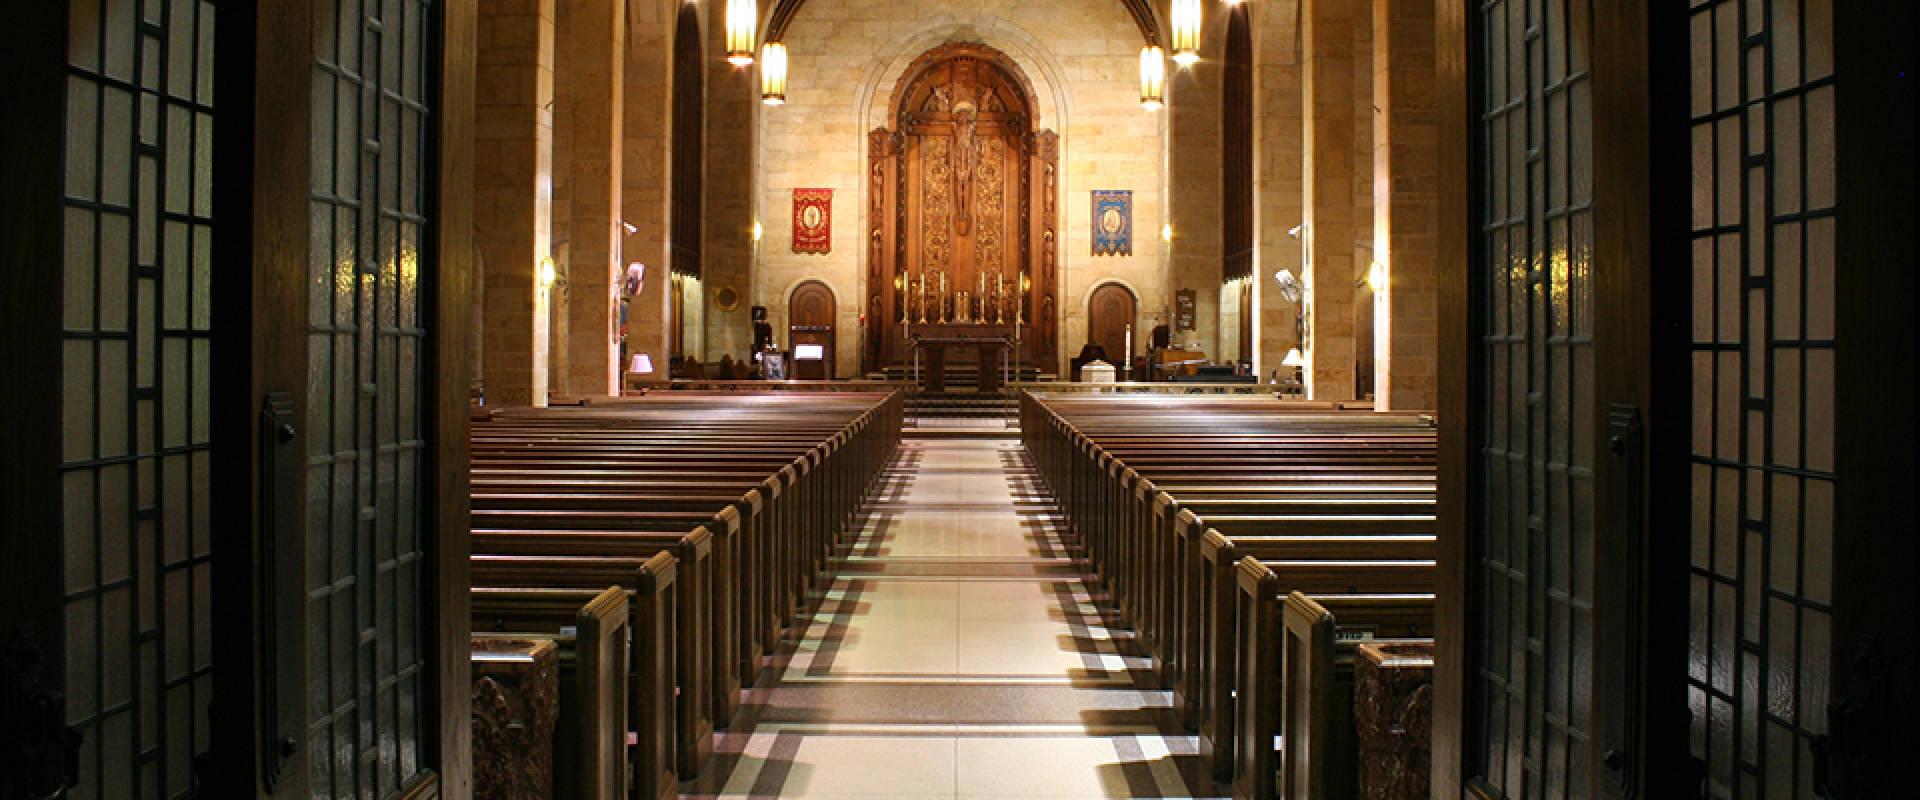 Beautiful Catholic Church Mass #2: Pn9syihlt9kk2yqp5th2l2uo6ef.jpg